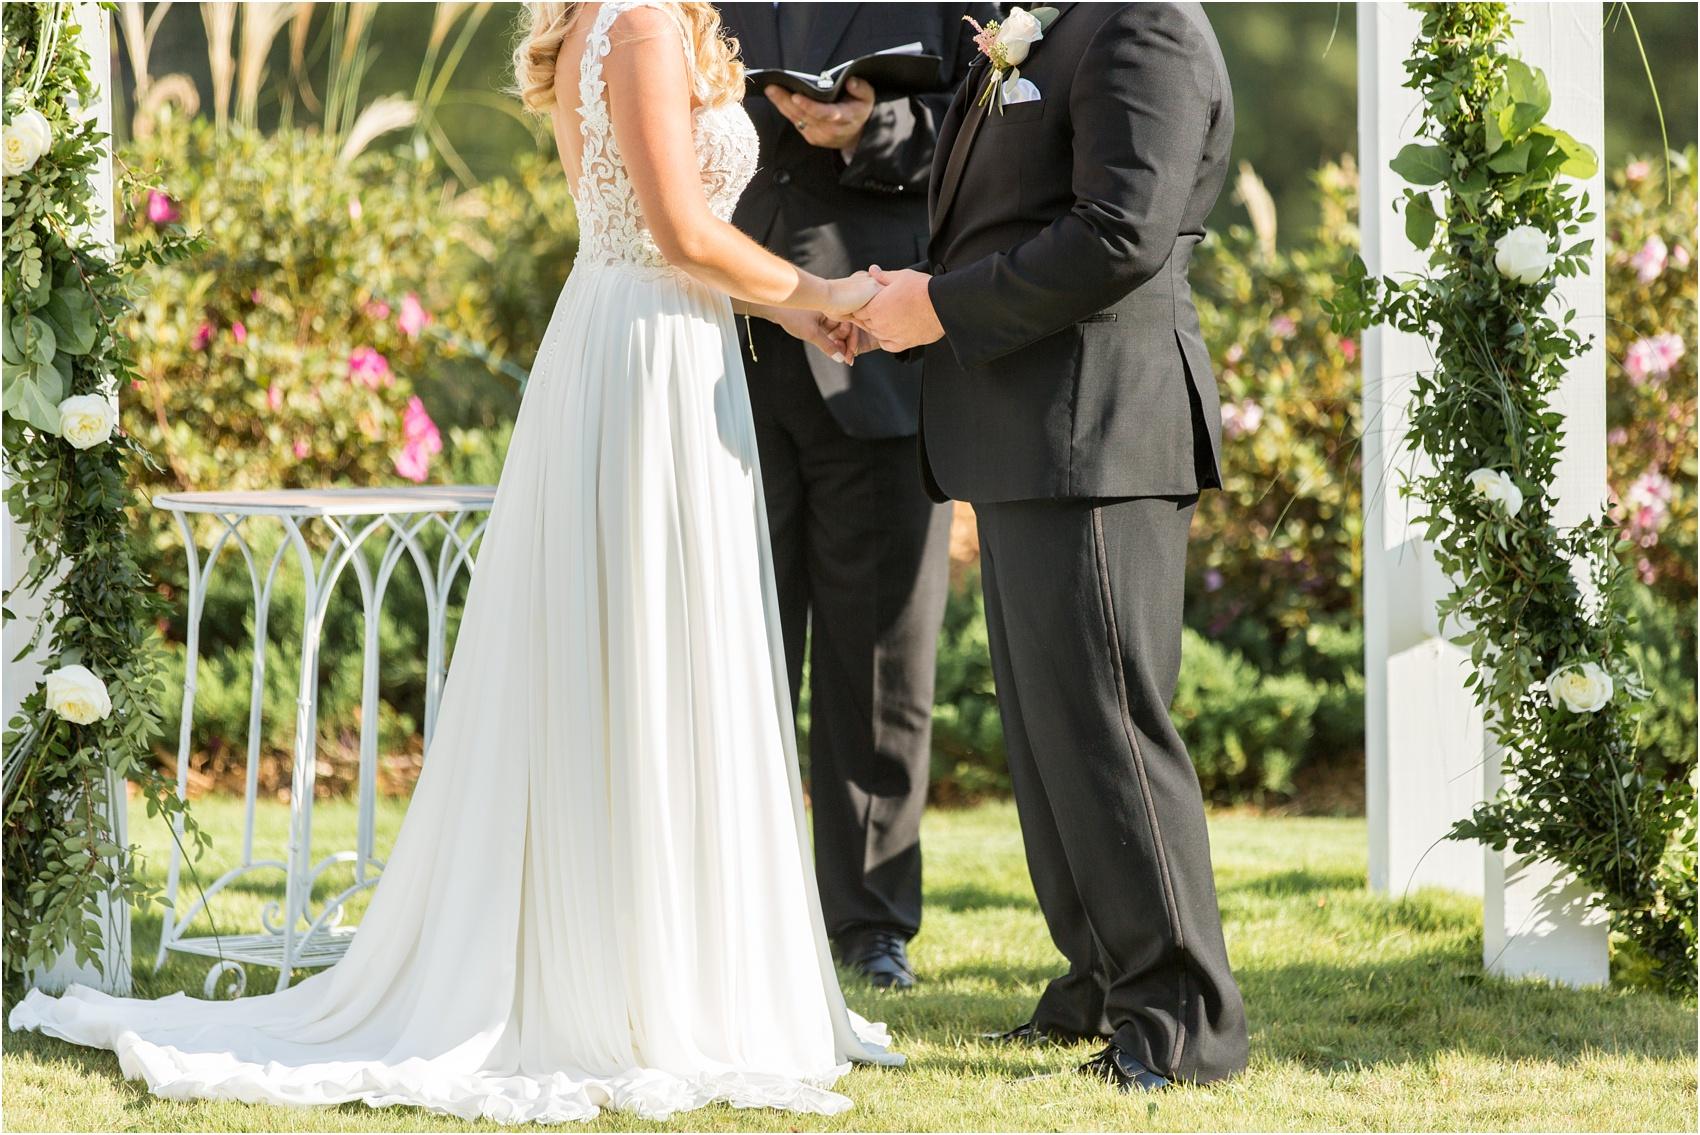 Savannah Eve Photography- Jurek-Woodworth Wedding- Sneak Peek-42.jpg